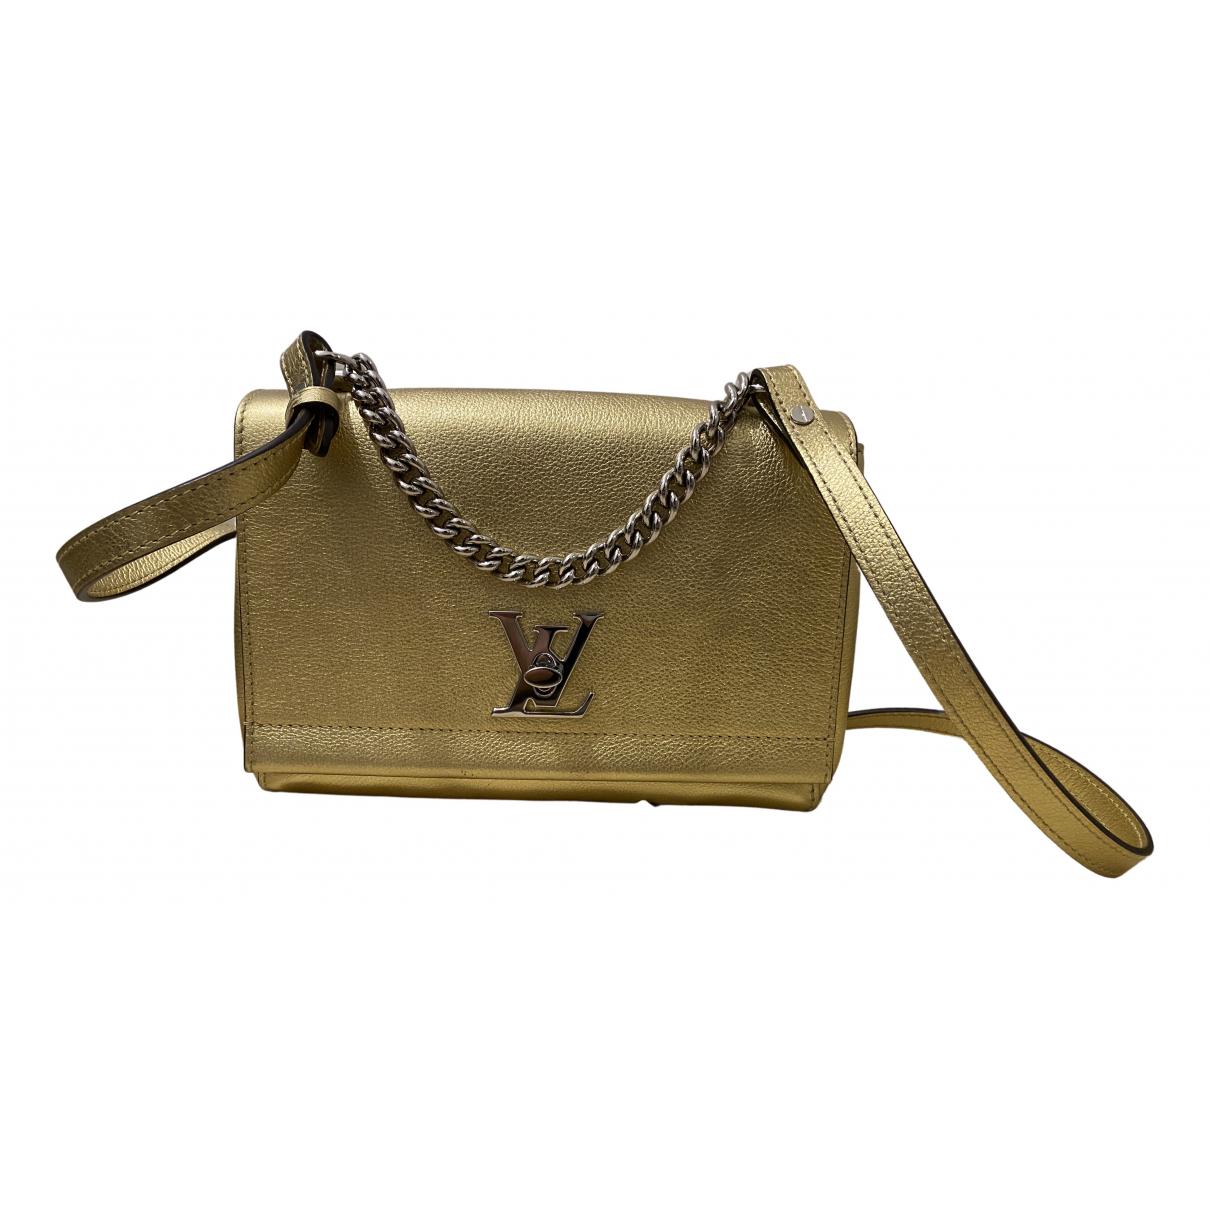 Louis Vuitton - Sac a main Lockme pour femme en cuir - dore